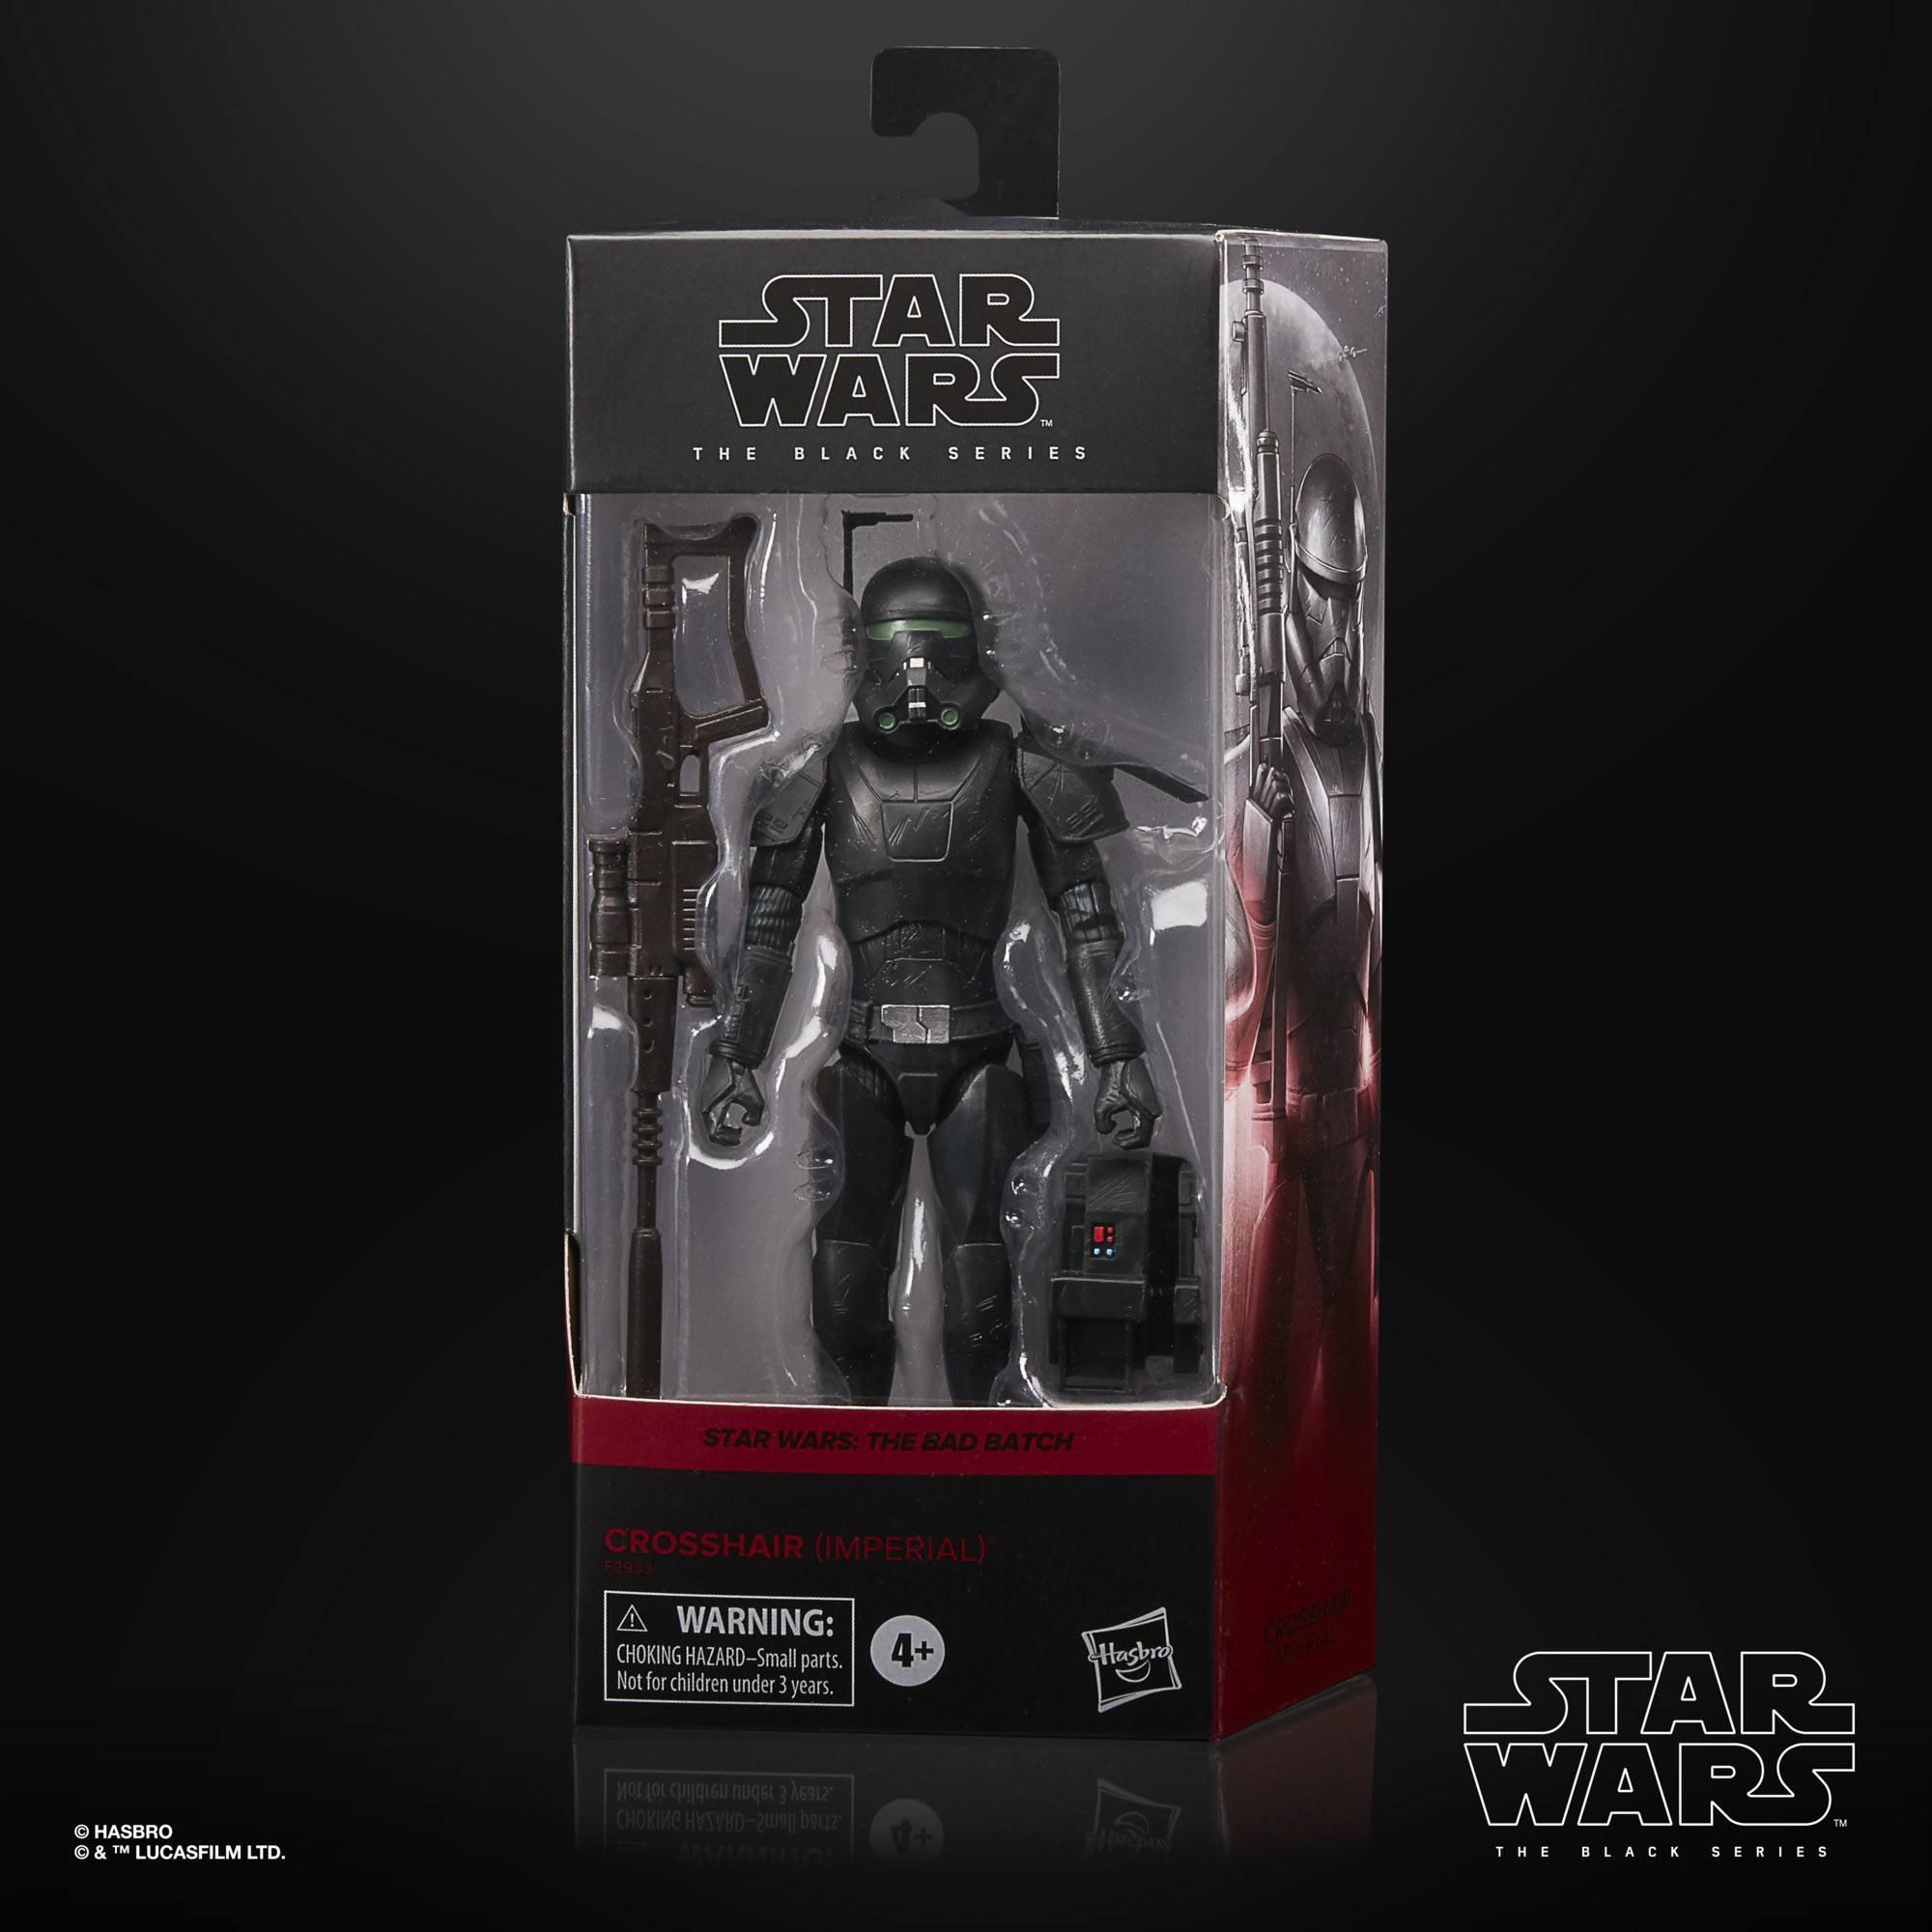 Star Wars The Black Series Crosshair (Imperial) F29335L00 5010993874224